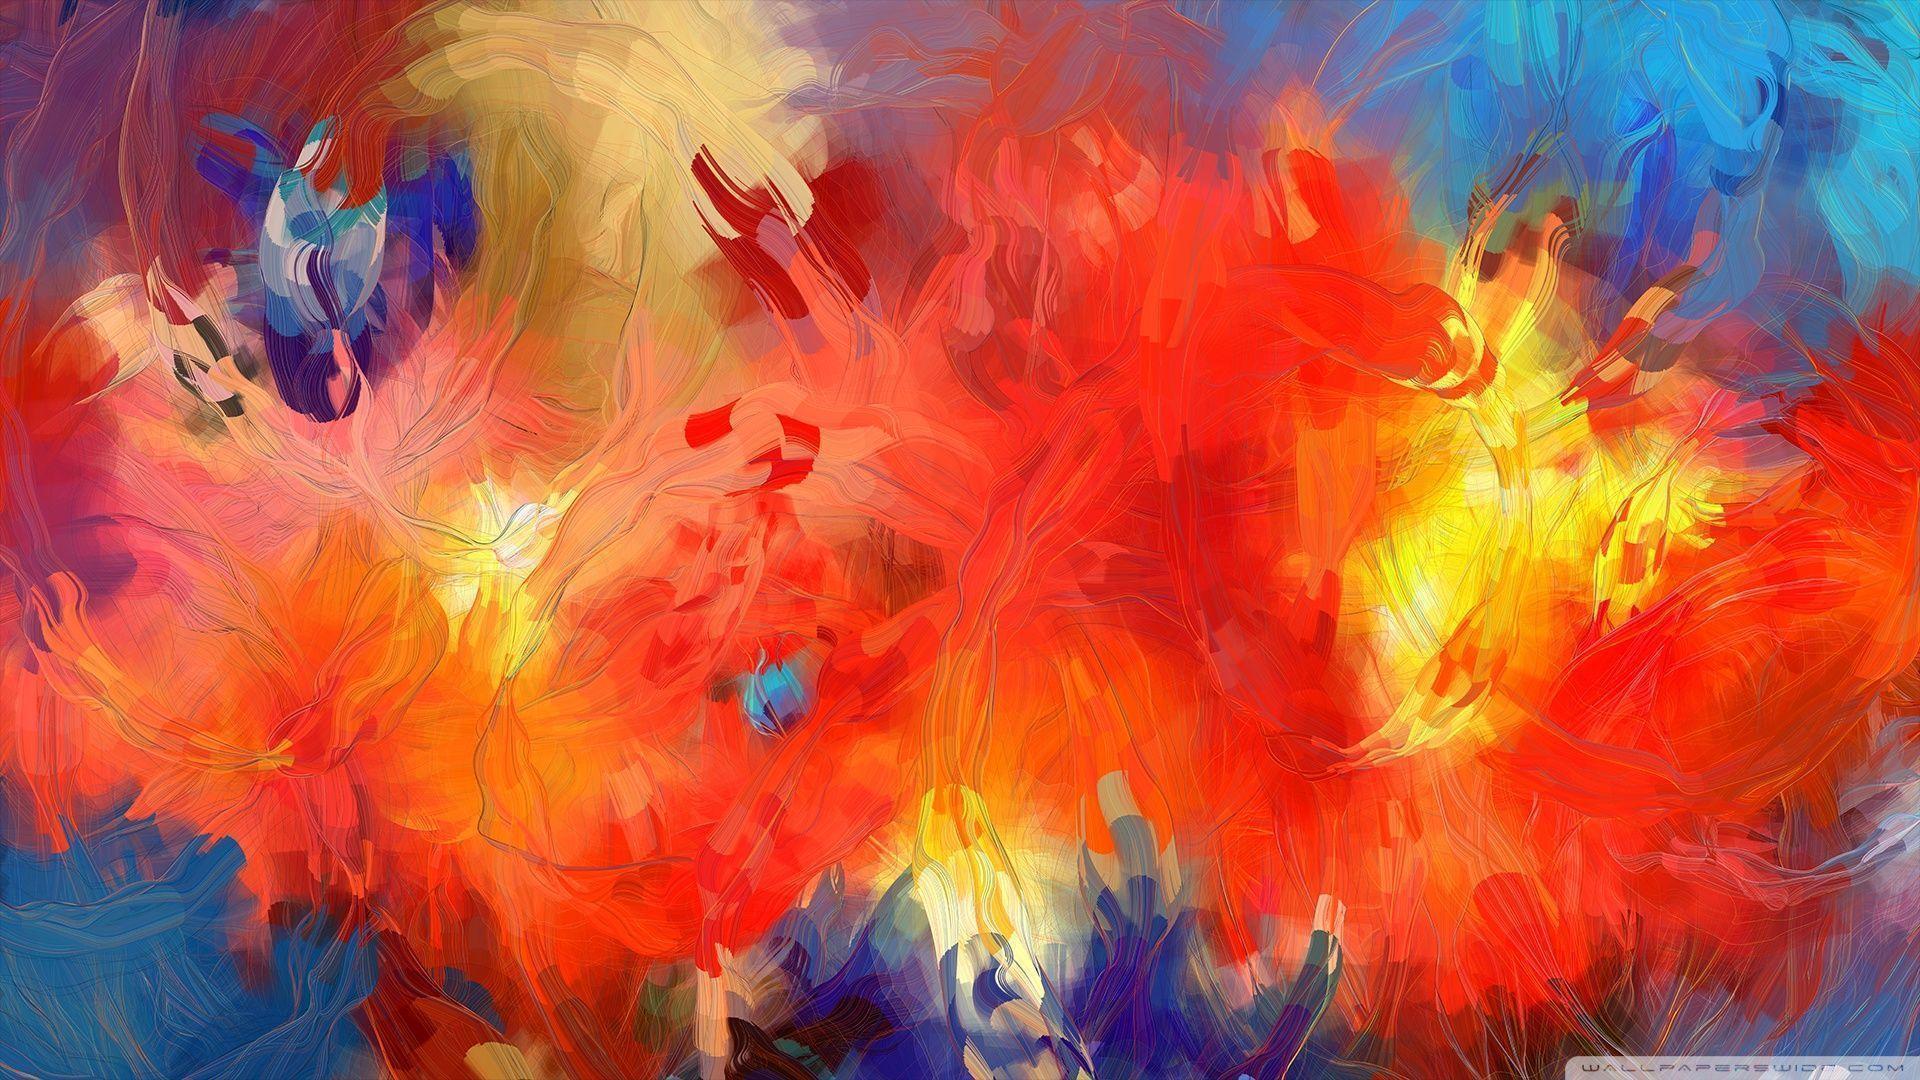 abstract christmas painting wallpaper - photo #7